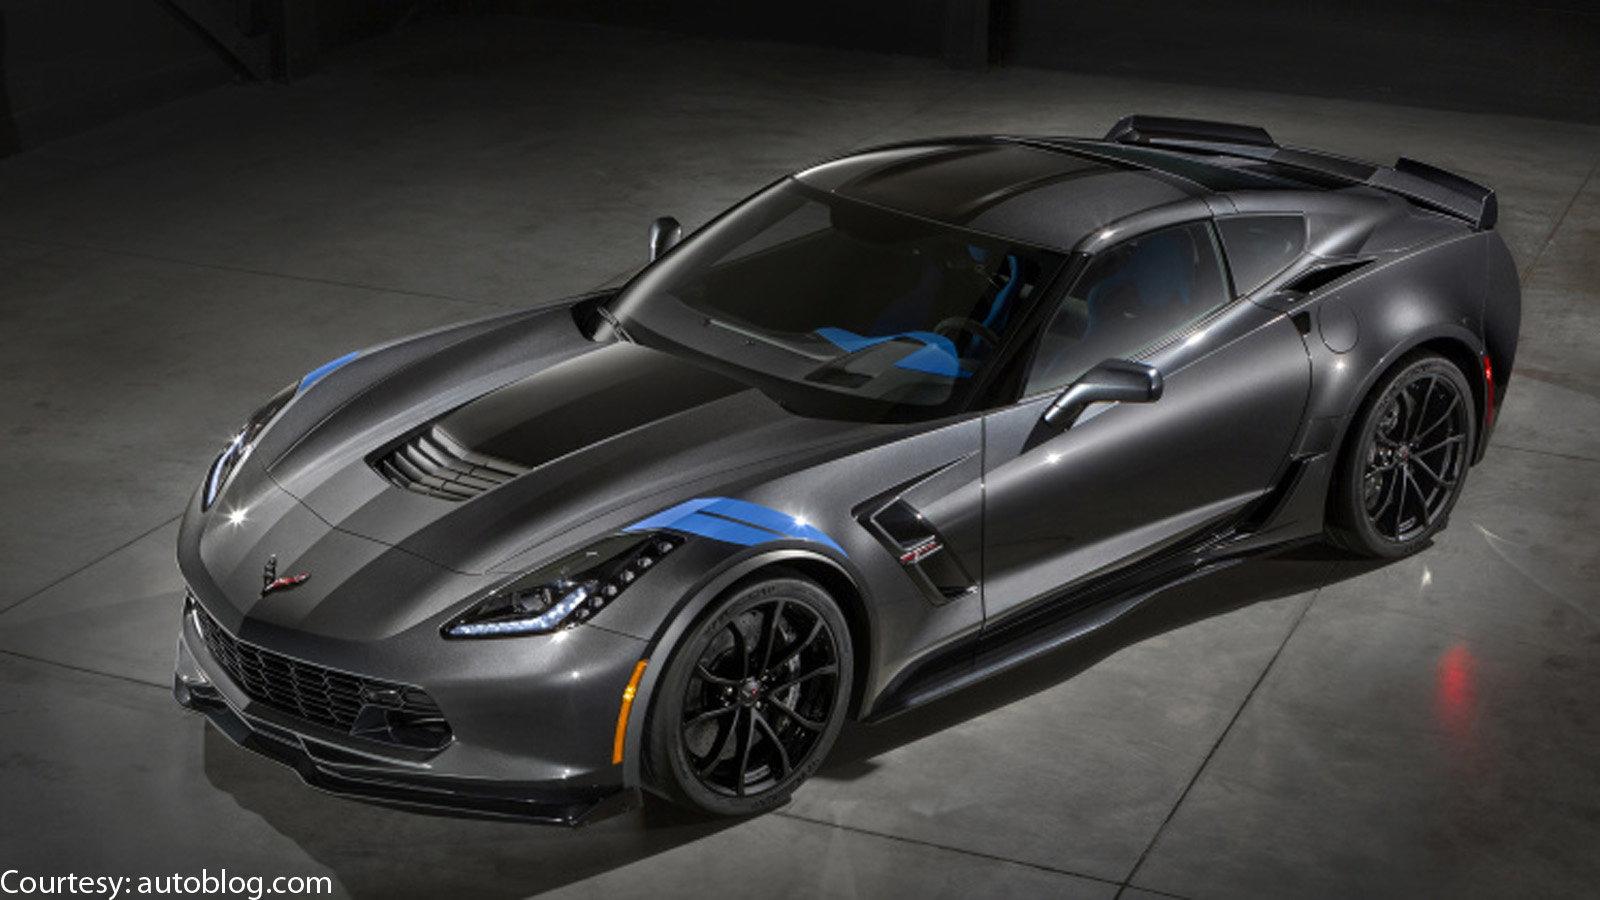 #001 Corvette Grand Sport